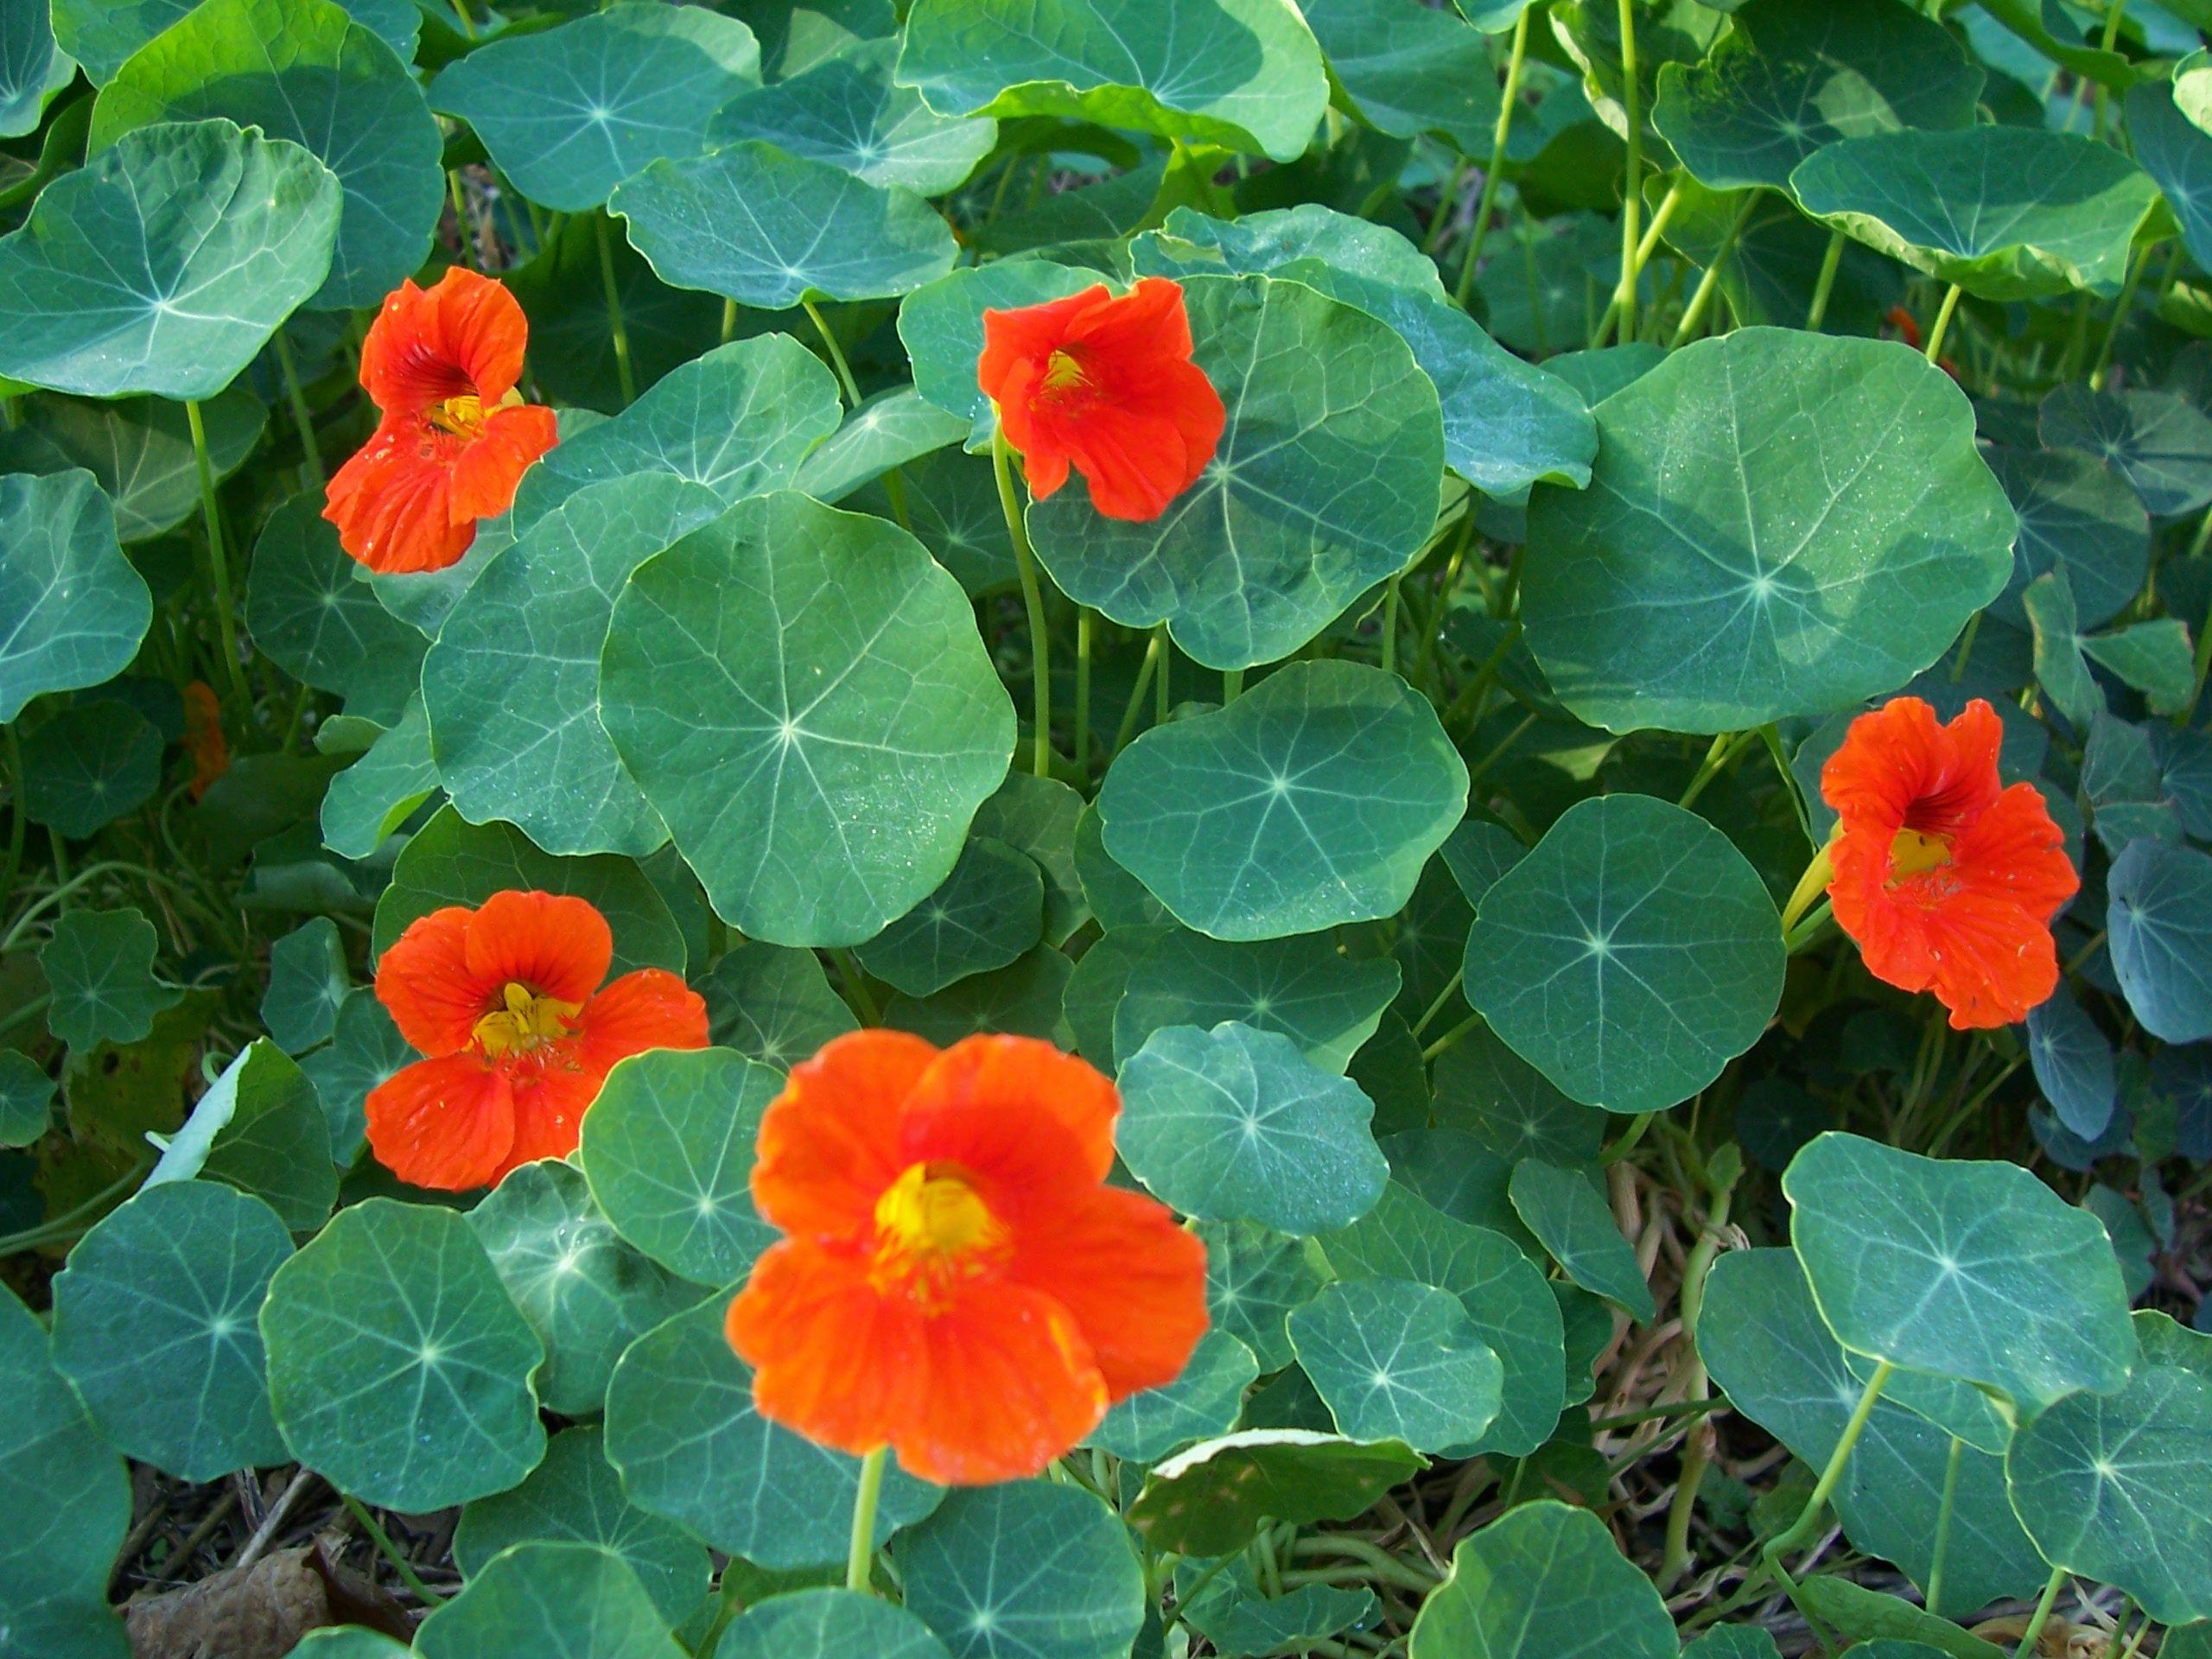 Buy culinary herbs plants nasturtium plants - Nasturtium Has Edible Tangy Flowers And Leaves